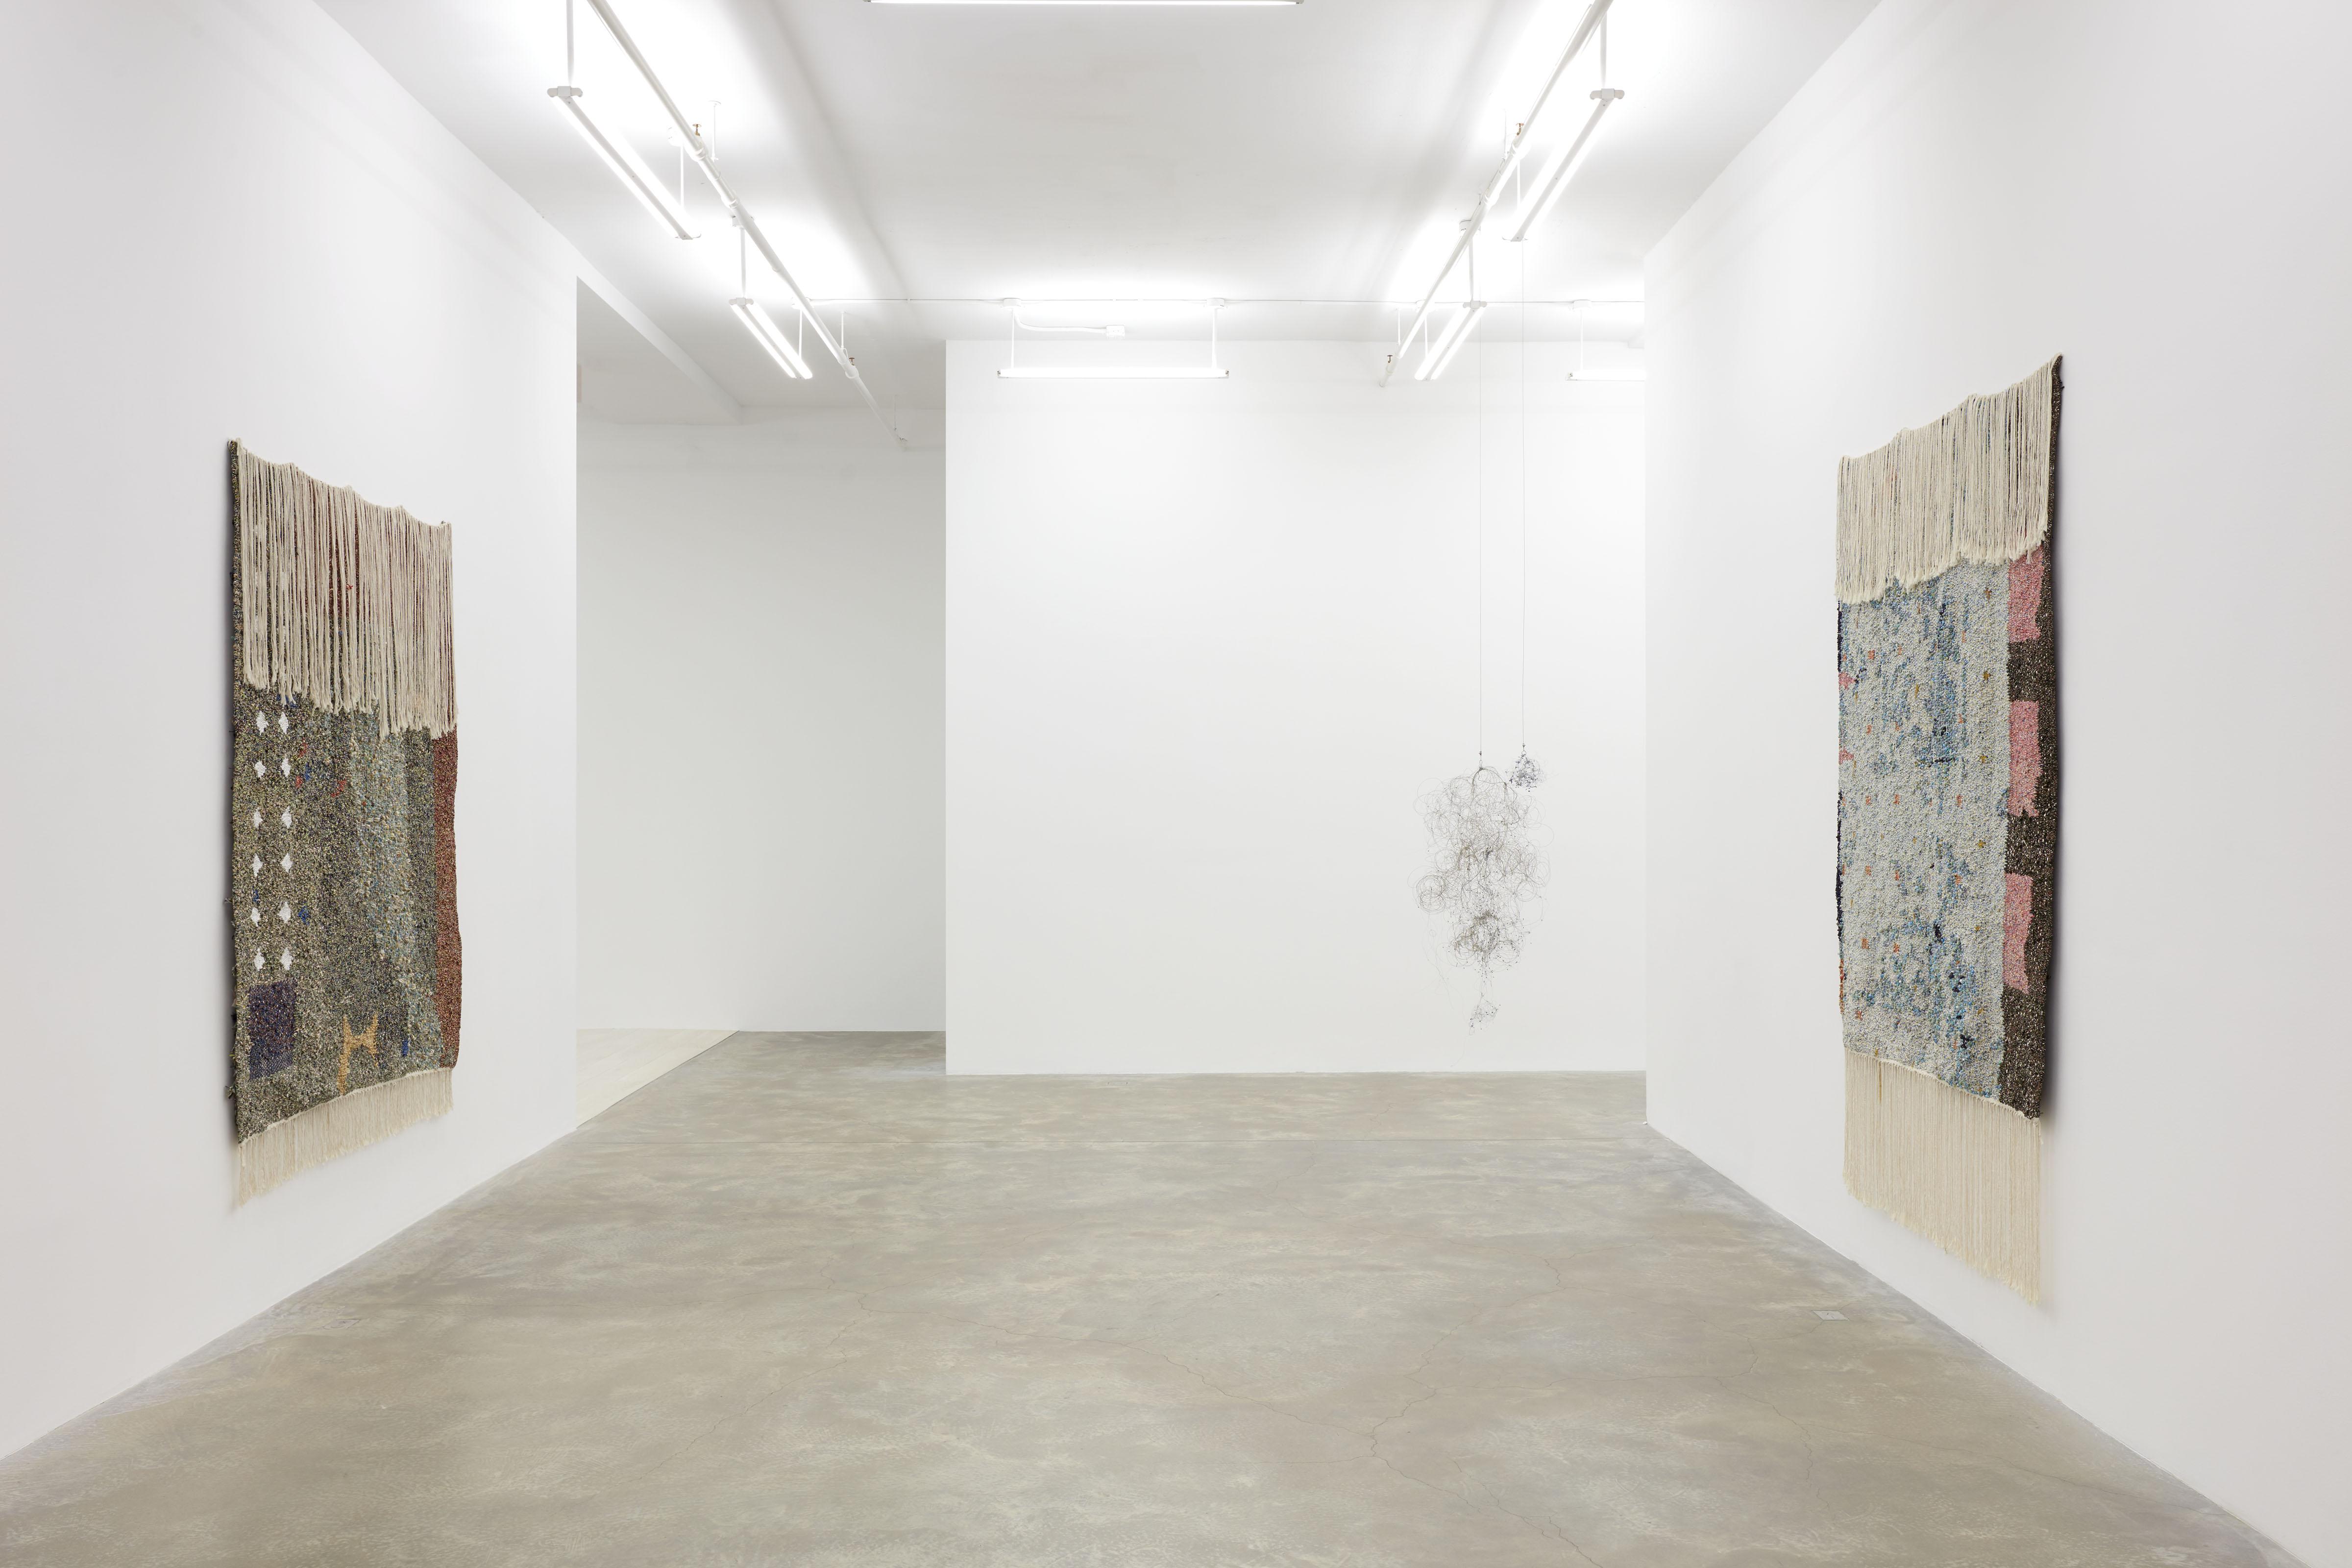 Installation view: Igshaan Adams, Veld Wen, Casey Kaplan, New York, May 1 - July 30, 2021. Photo: Jason Wyche. ©Igshaan Adams. Courtesy the artist and Casey Kaplan, New York.